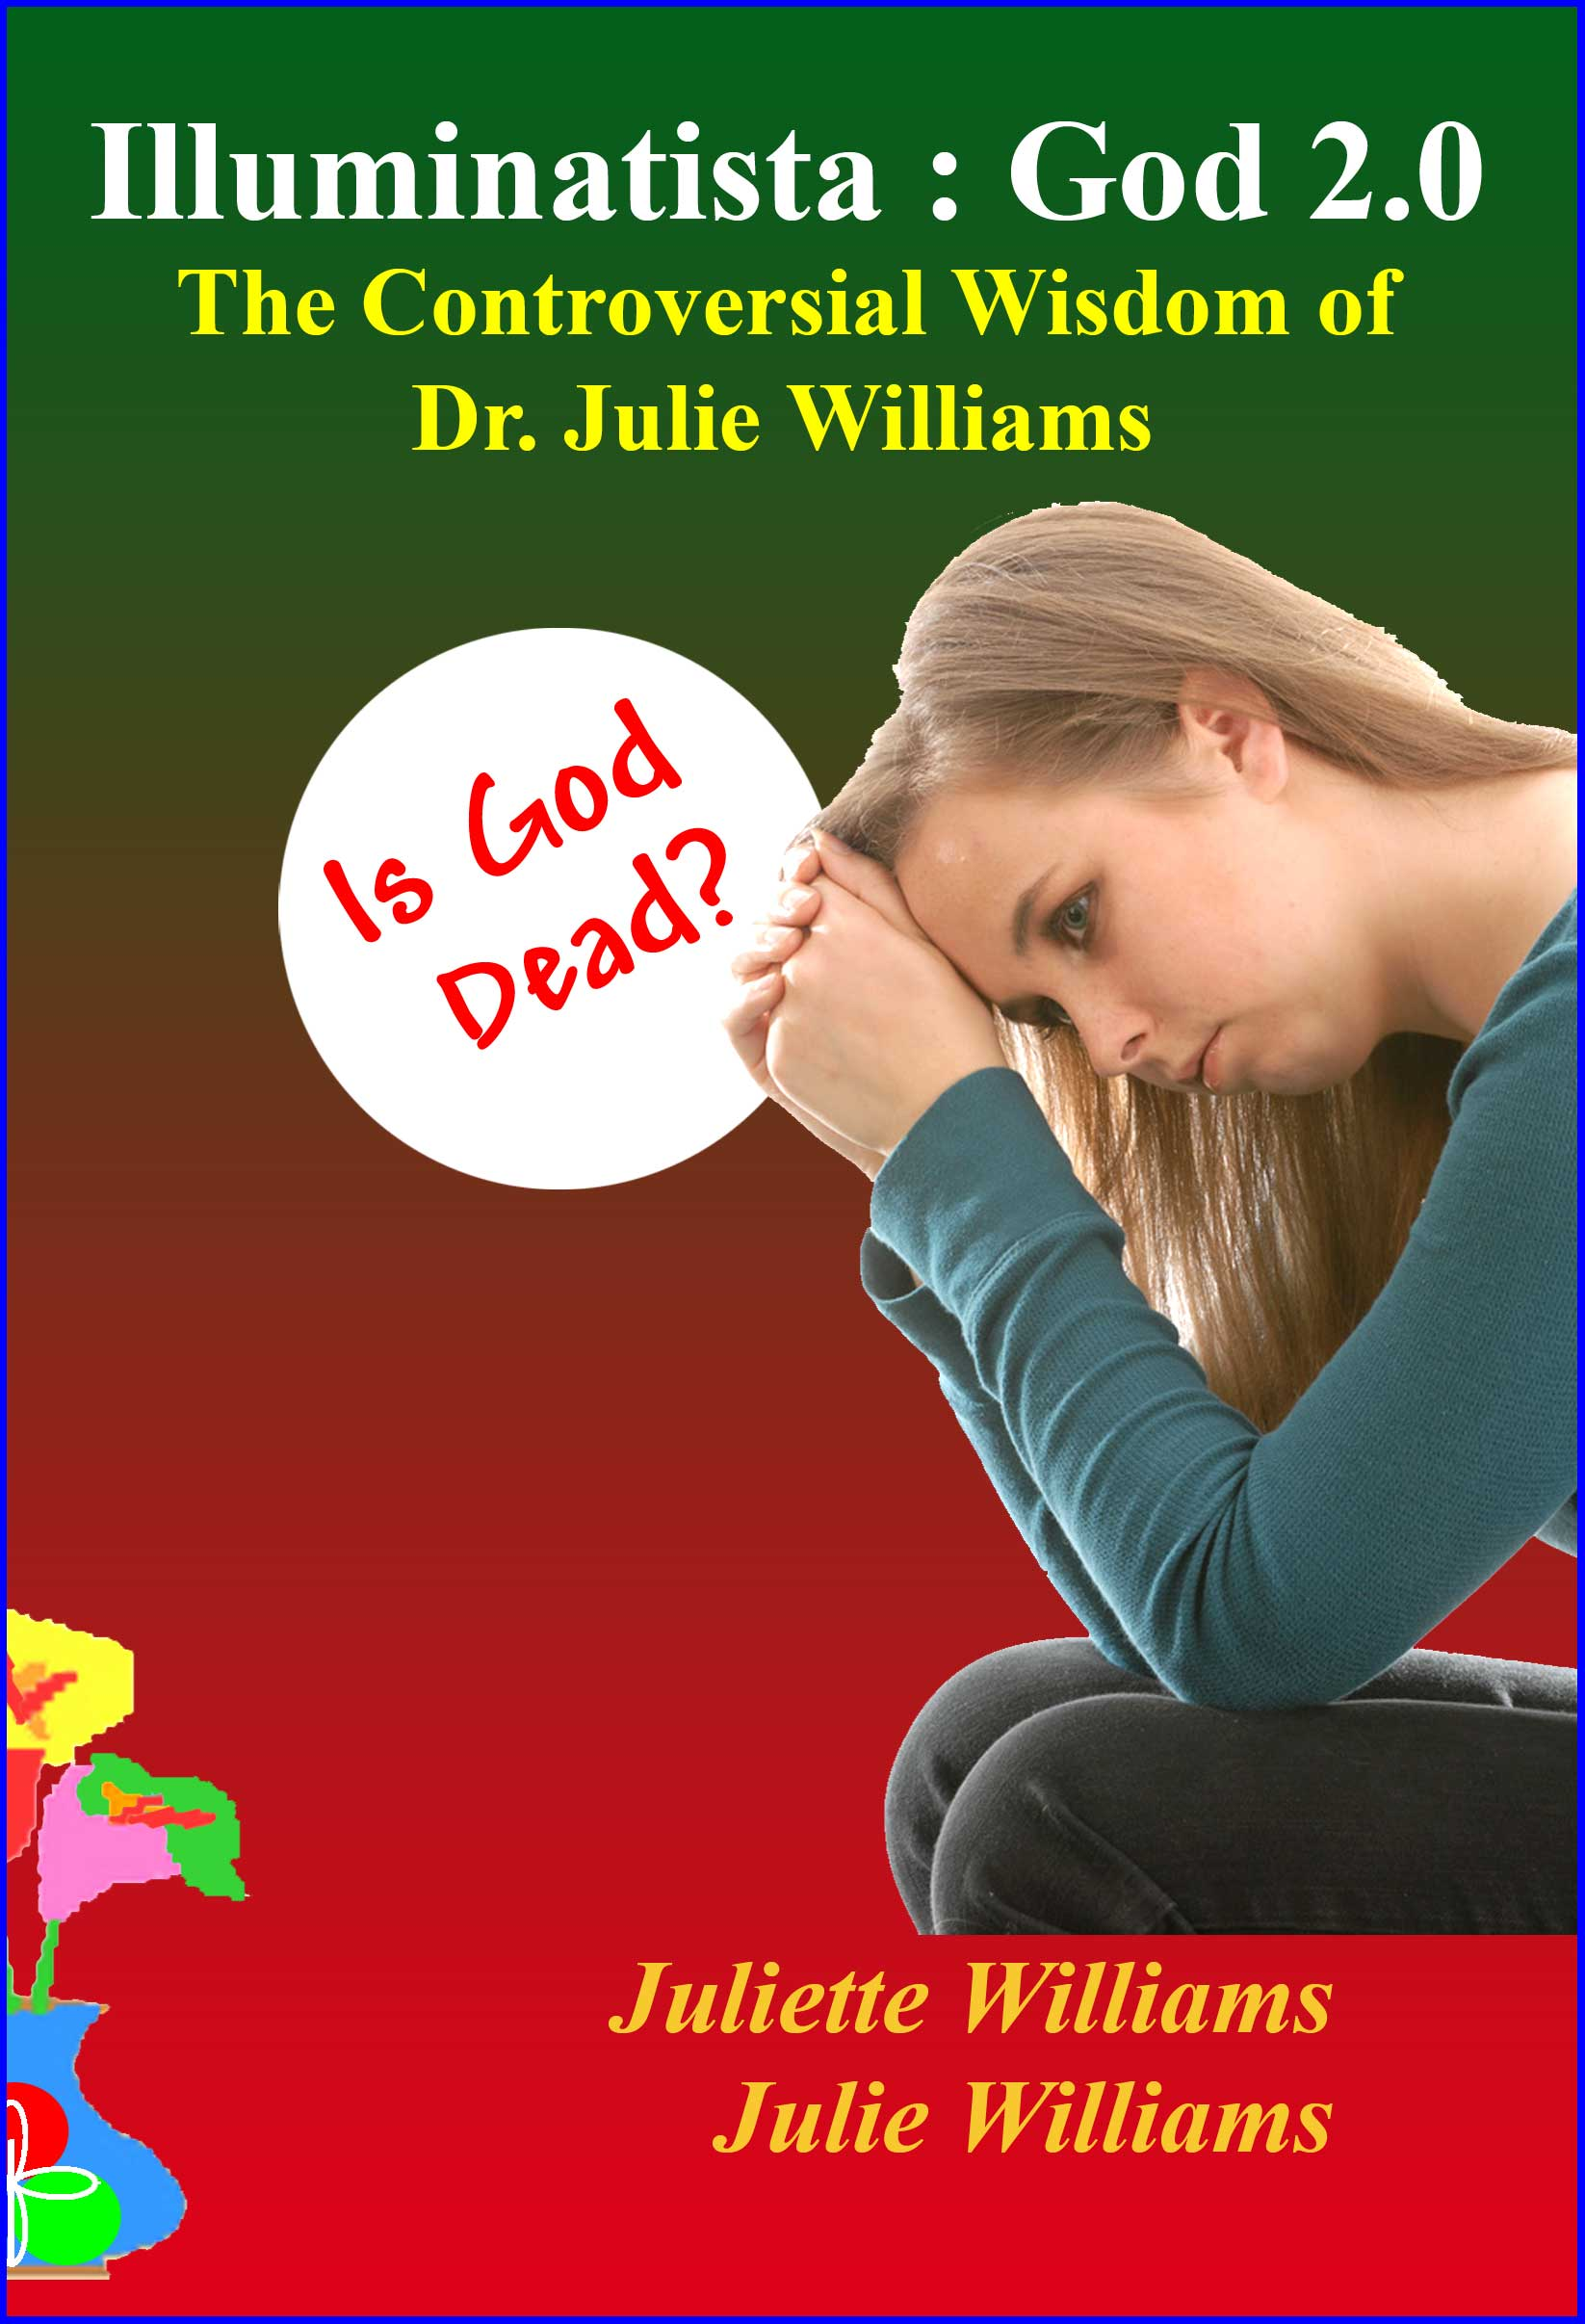 Illuminatista: God 2.0, by Juliette Williams and Julie Williams